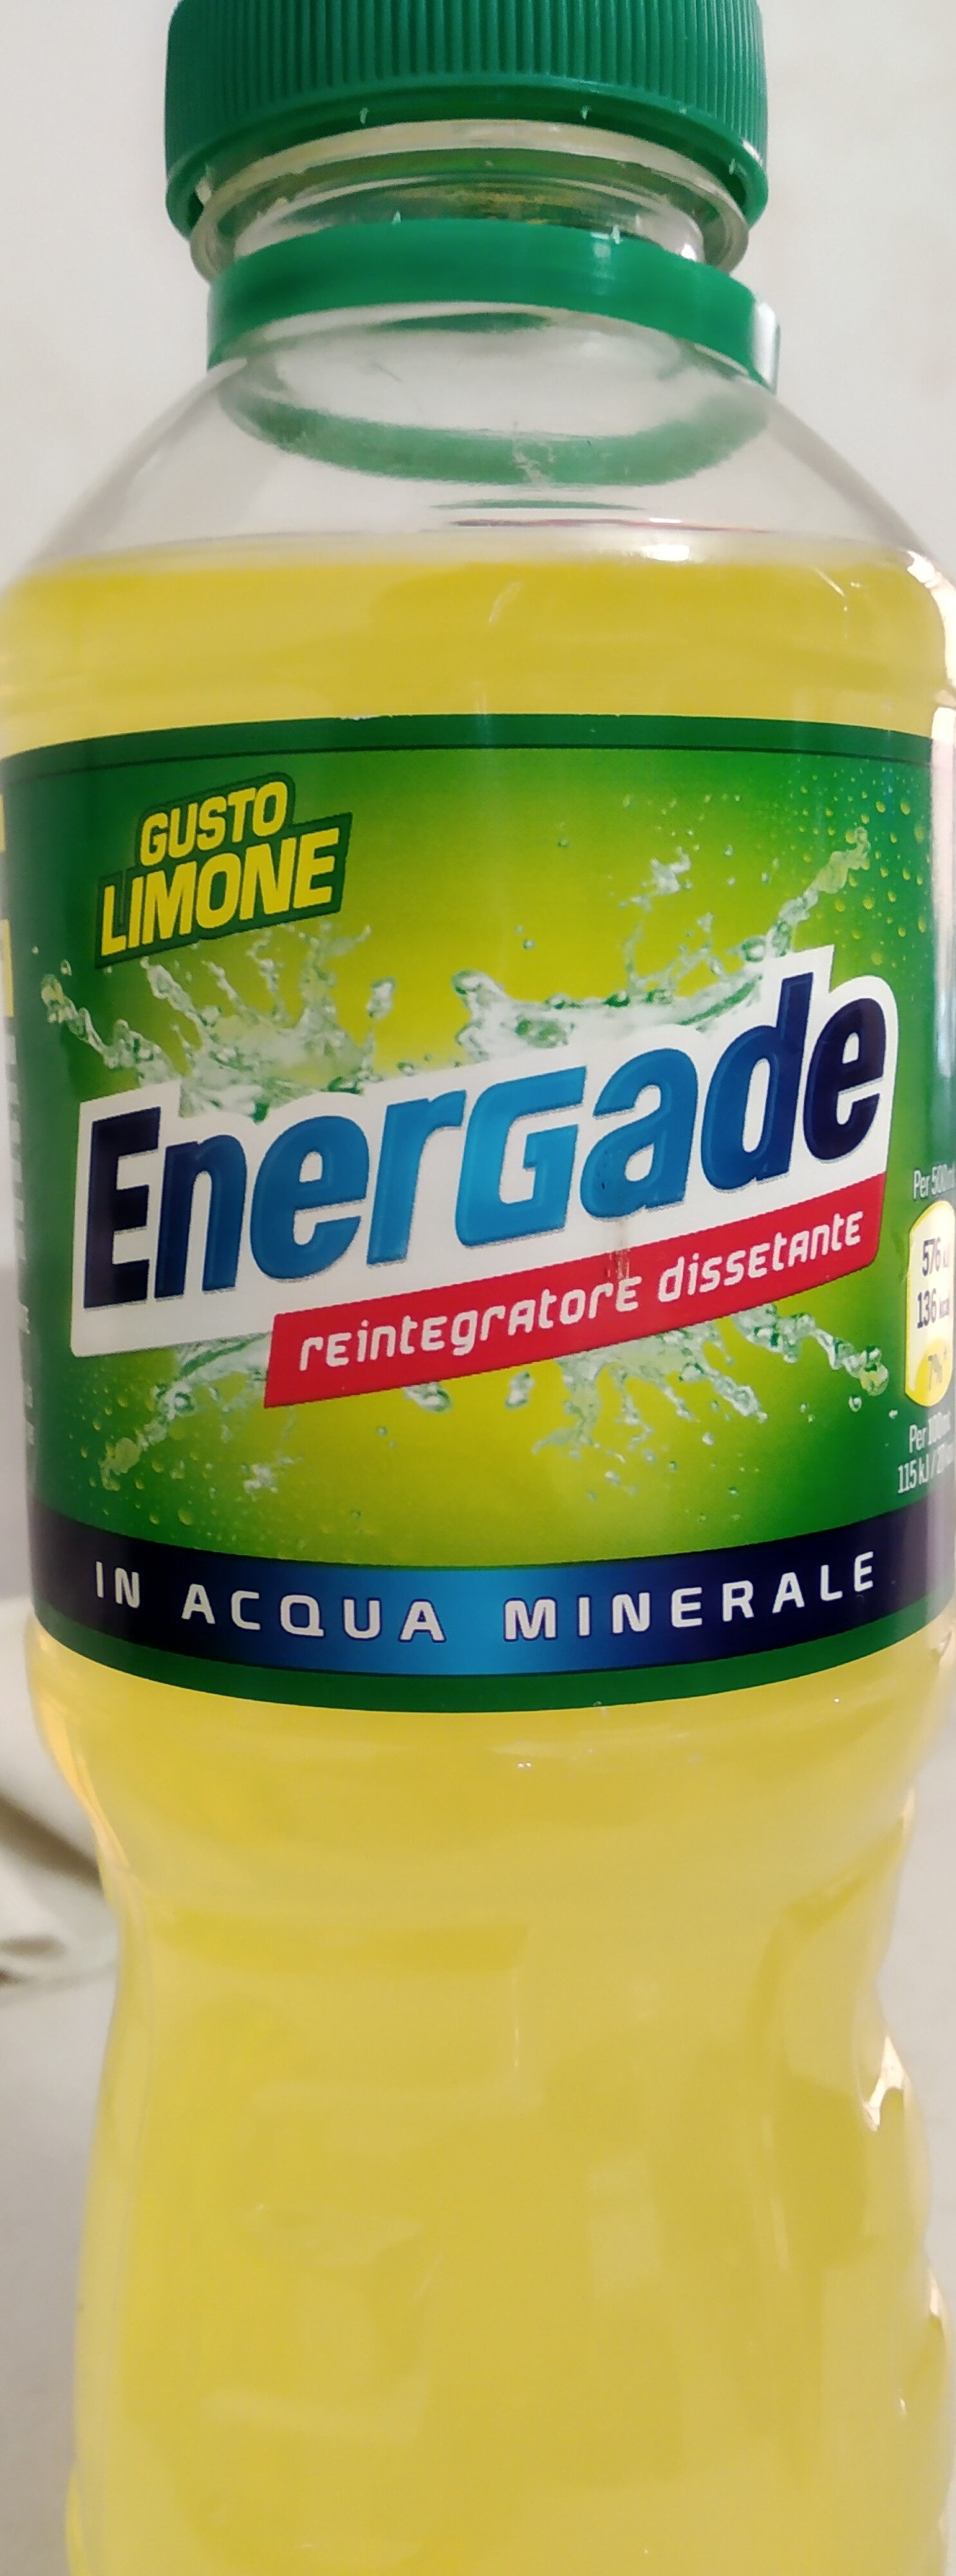 Energade limone - Produit